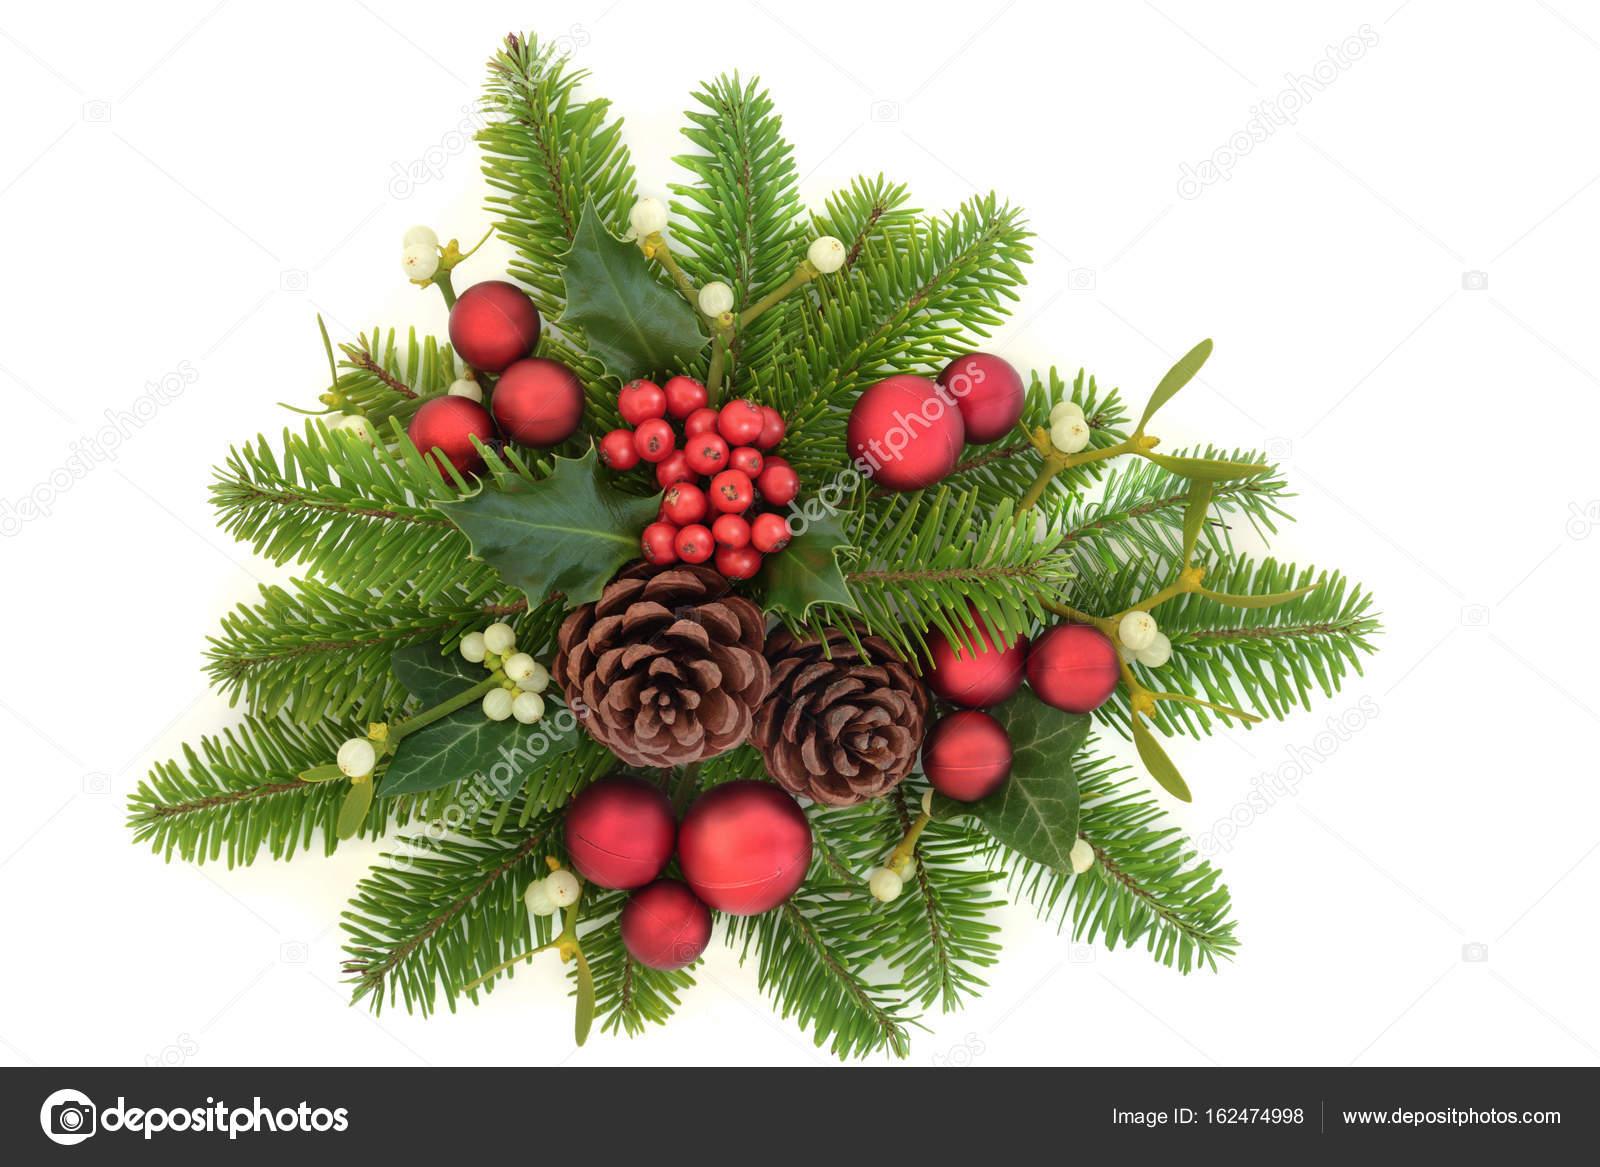 Christmas Greenery Images.Decorative Christmas Greenery Stock Photo C Marilyna